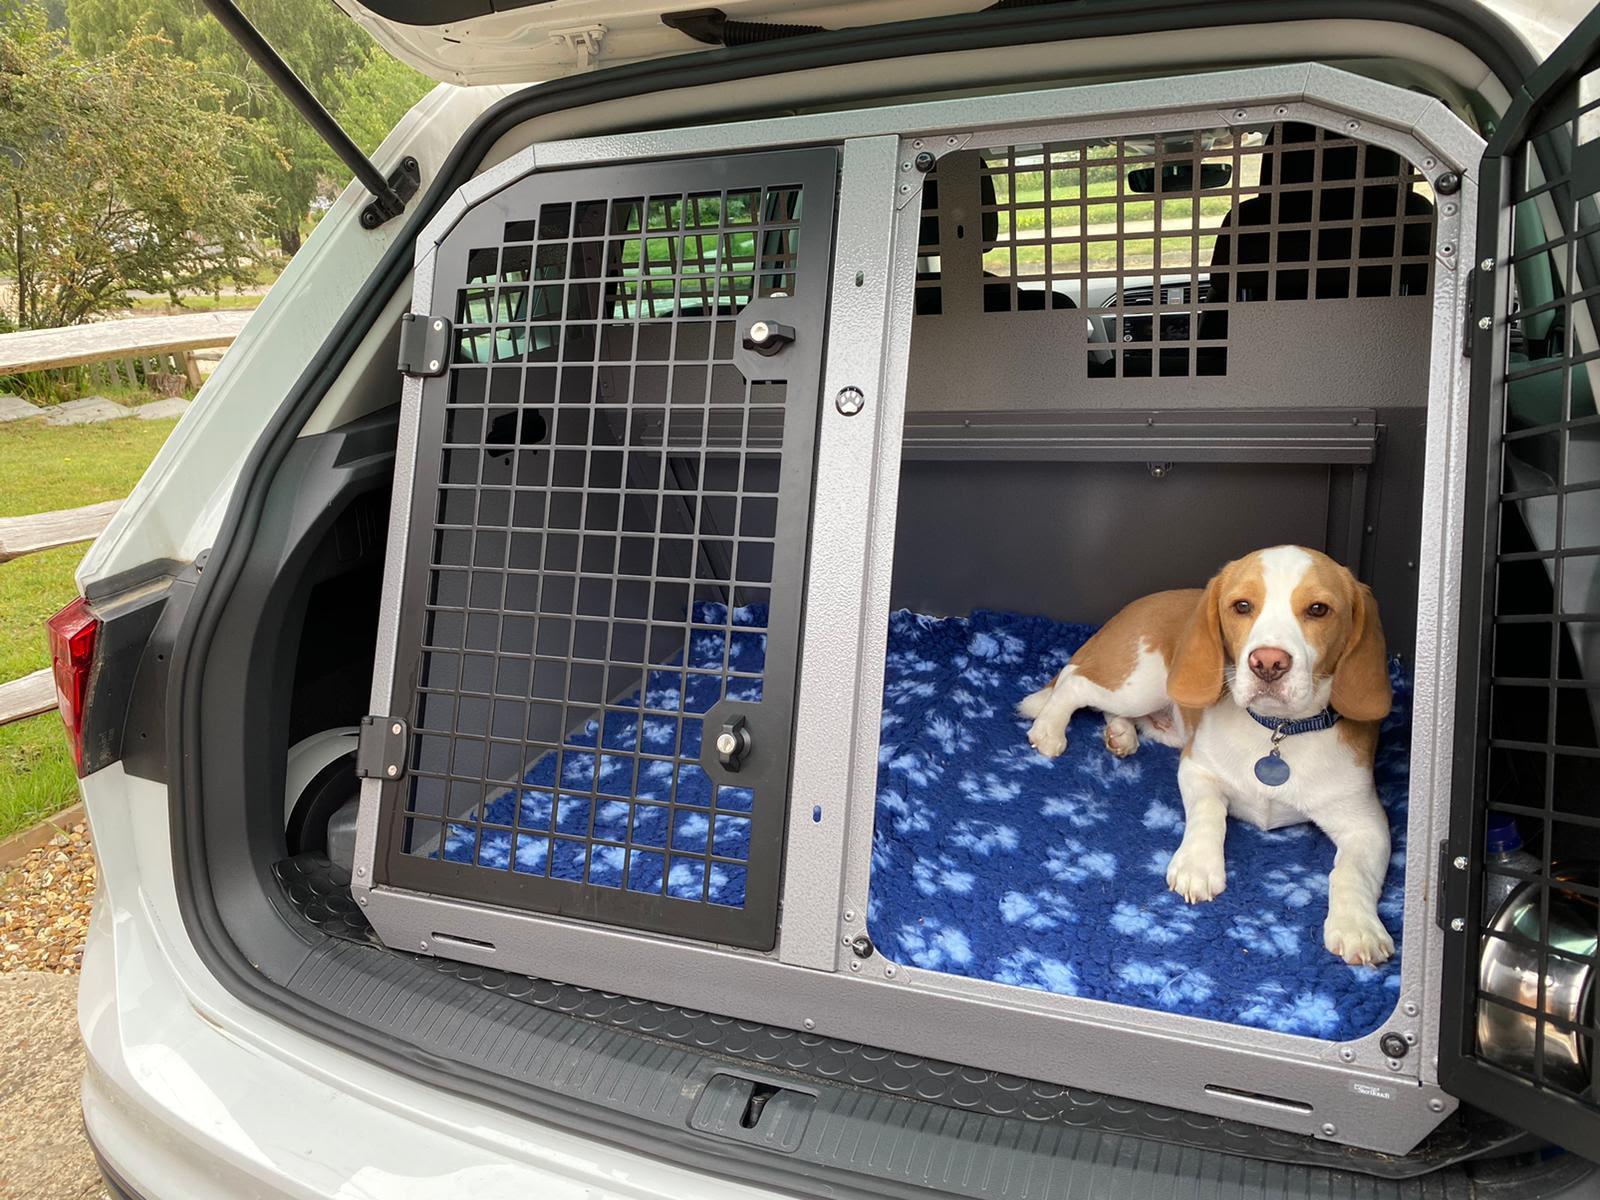 Bed and Bone Dog Boarding K9 Crash tested car dog crates